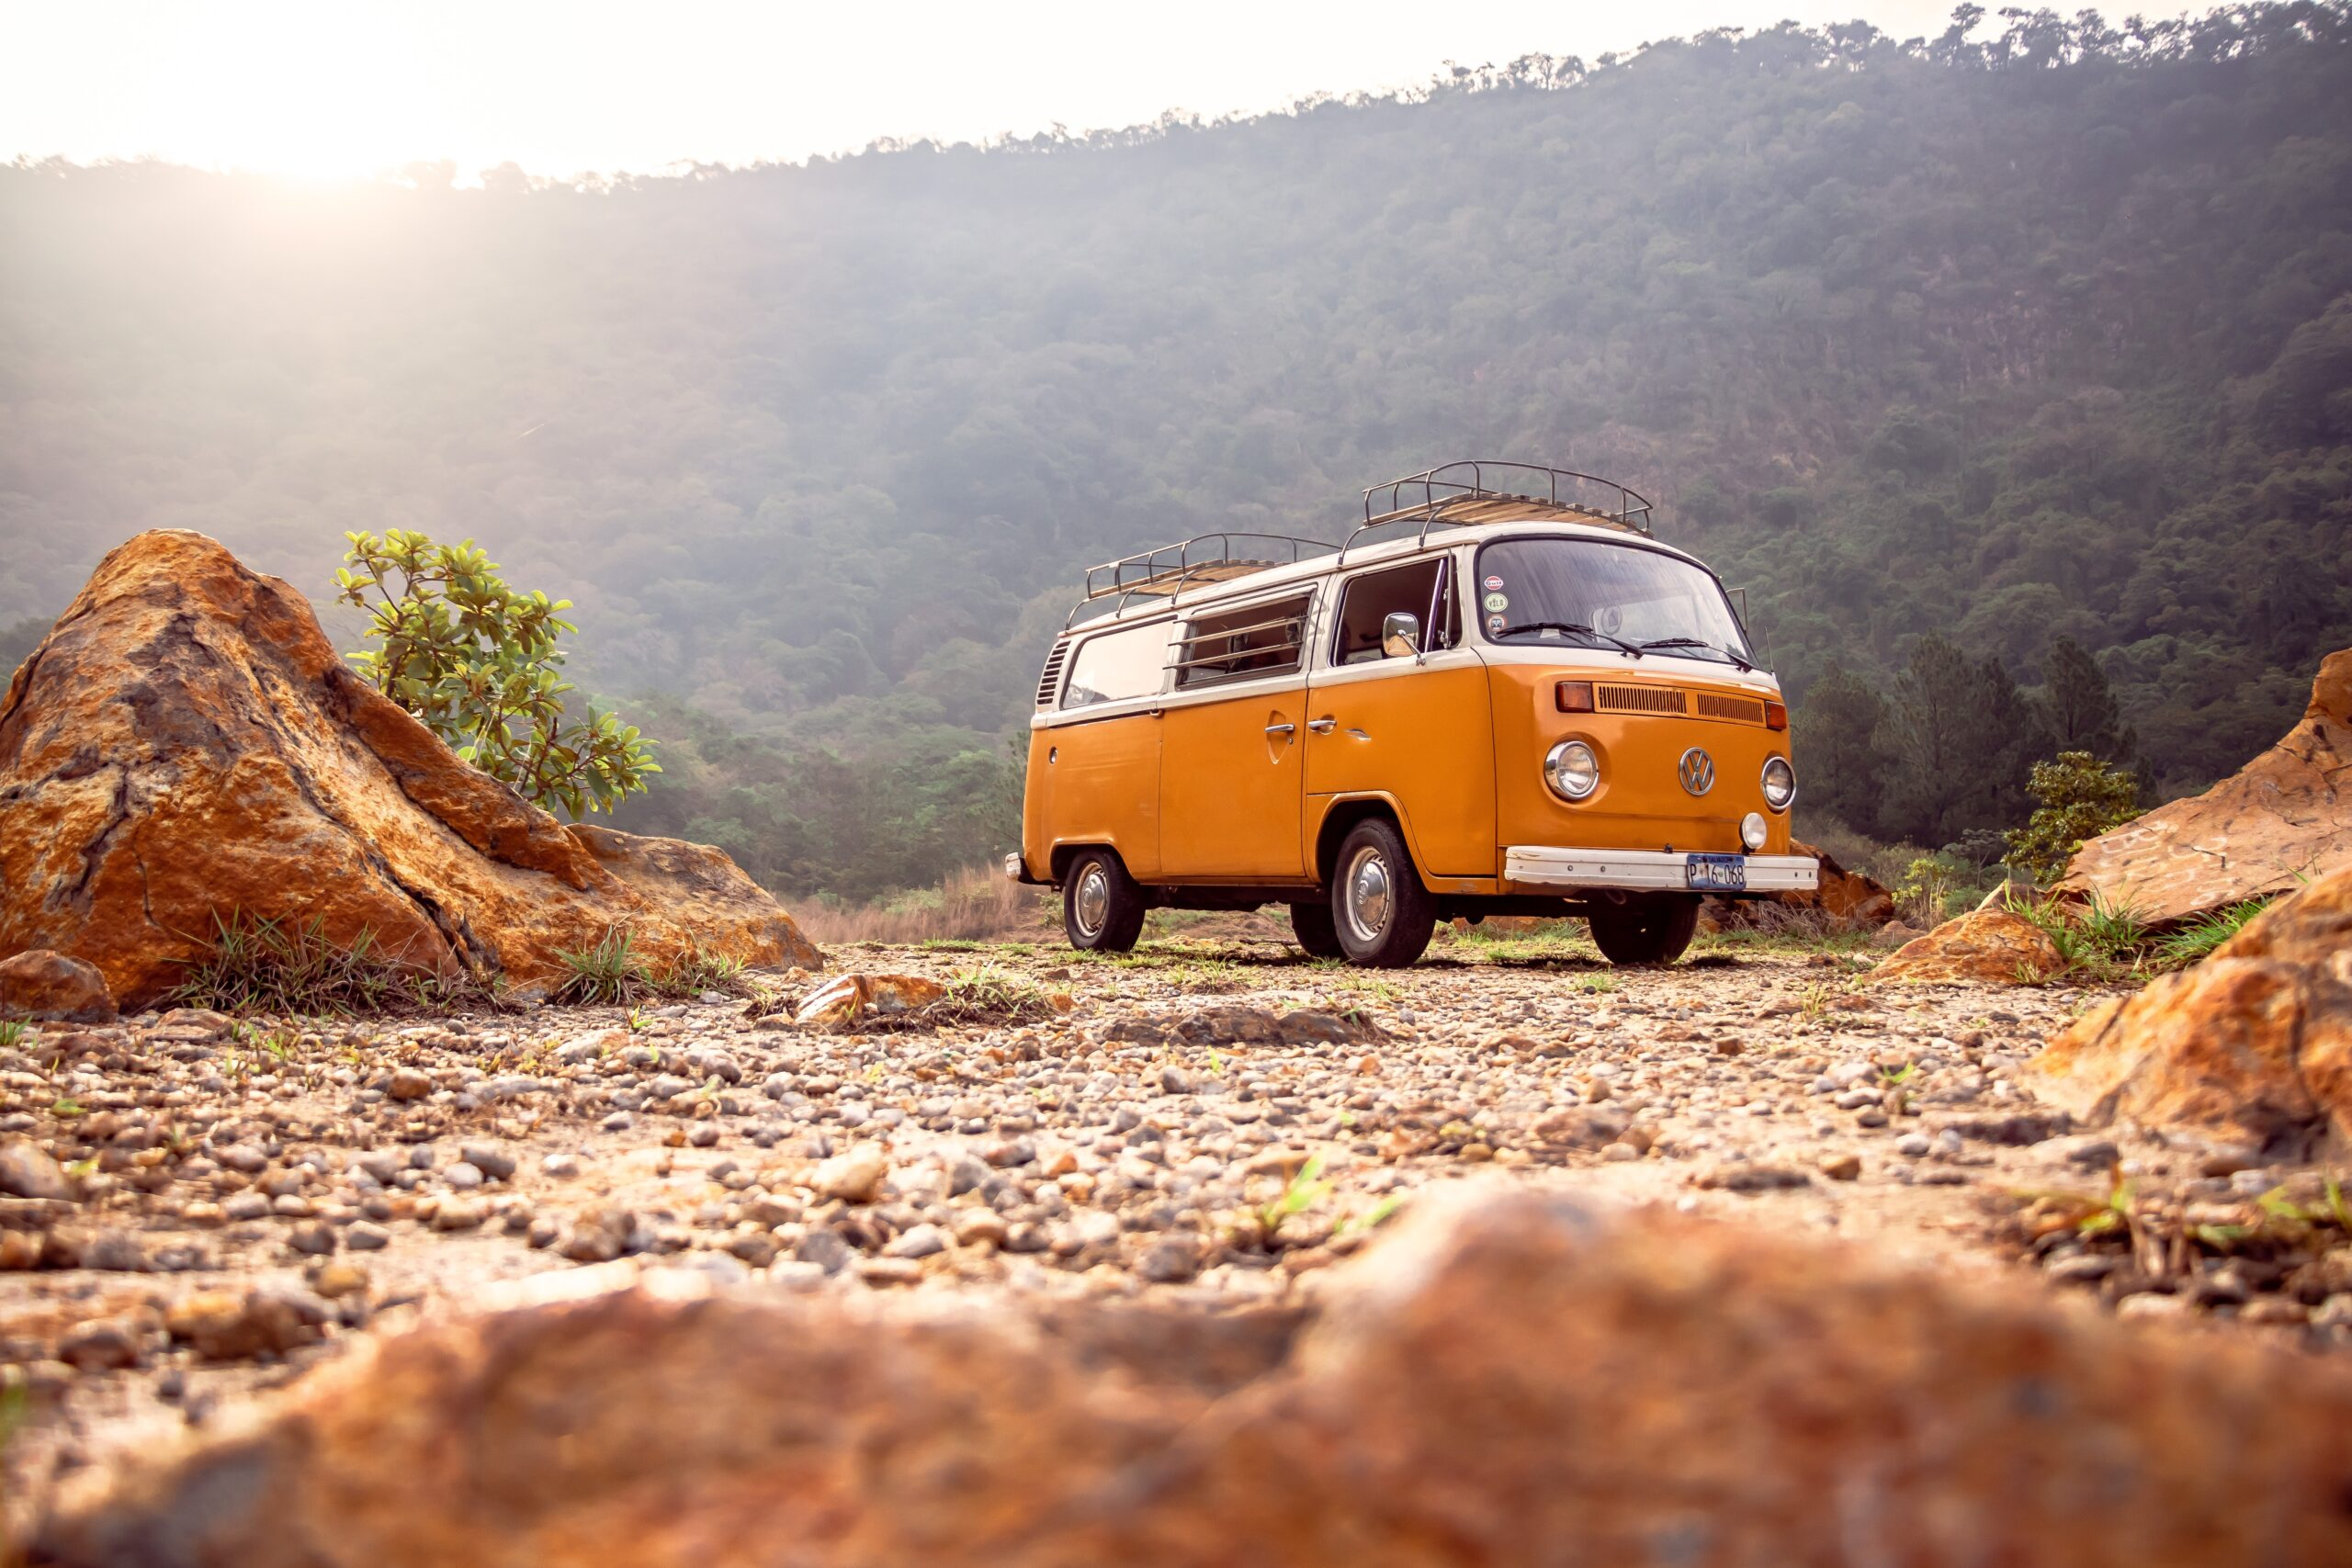 AterImber.com - No. Mad. - Tiny Houses vs Skoolies vs Van Life - Desert Van - vanife, skoolies, tiny living, blogger, lifestyle blogger, boondocking, travelling, traveller, lifestyle tips, wanderlust, wanderer, living the dream